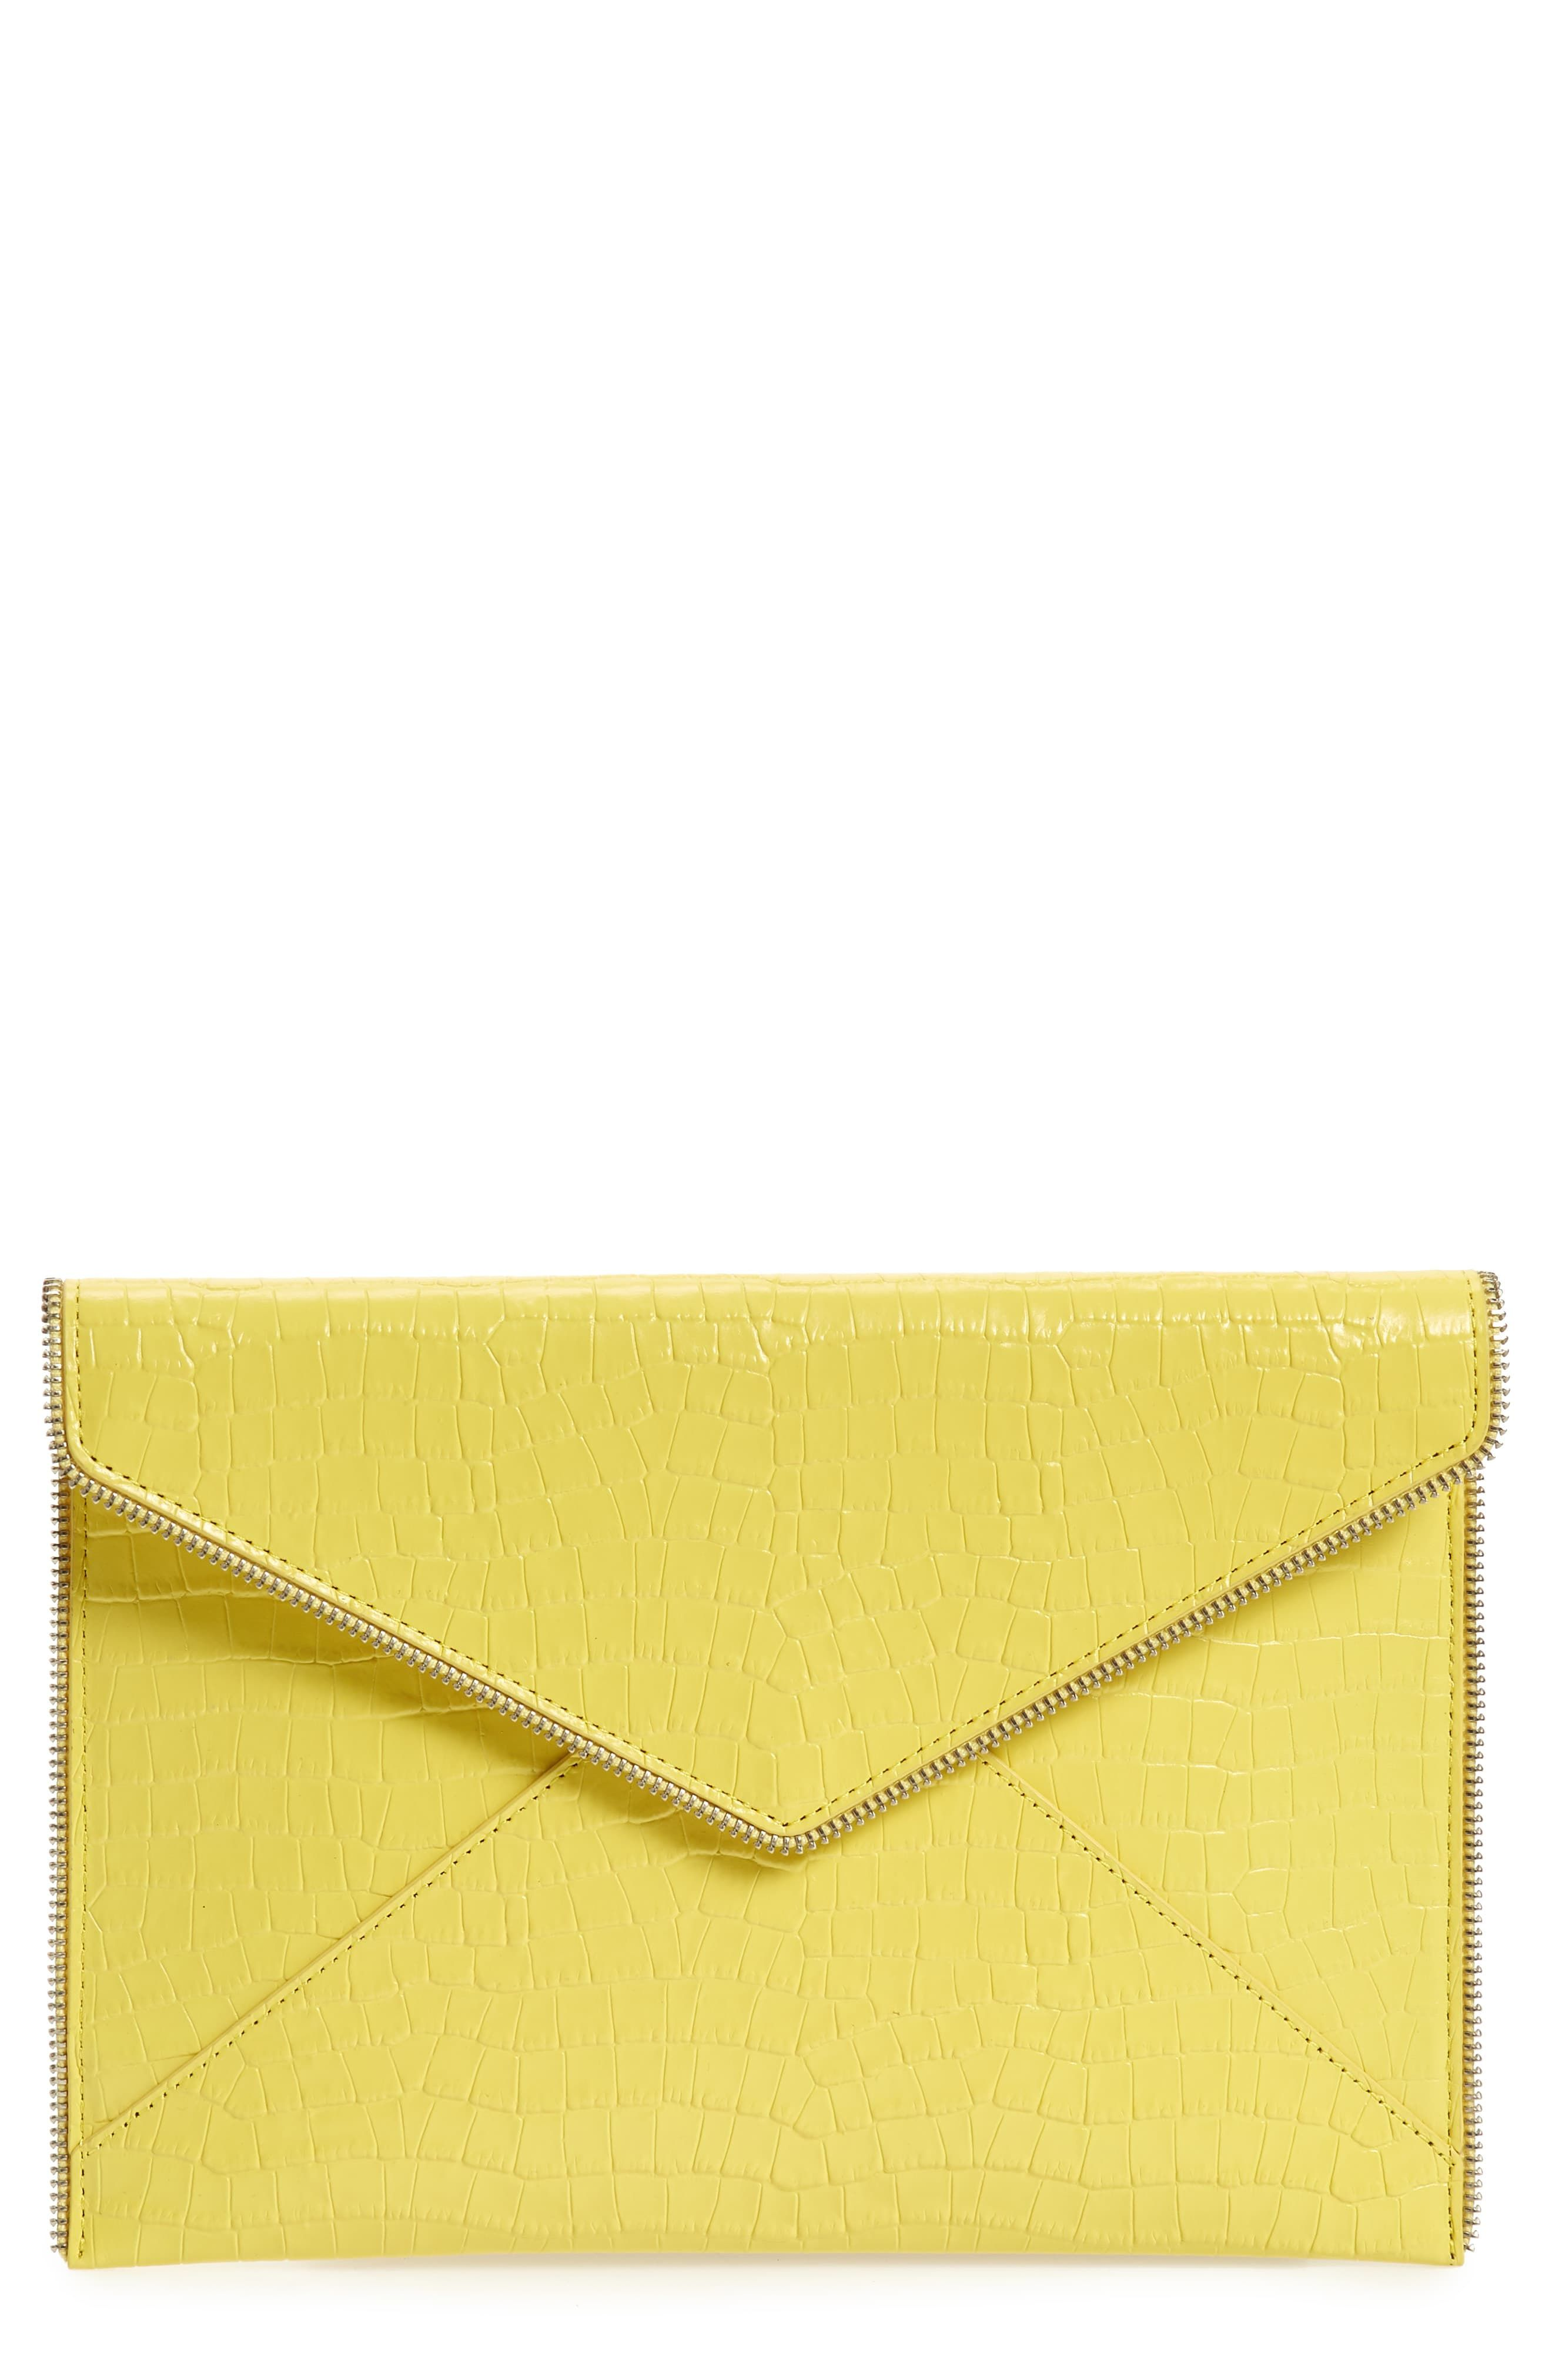 Rebecca Minkoff Leo Croc Embossed Leather Envelope Clutch Envelope Clutch Best Leather Wallet Rebecca Minkoff